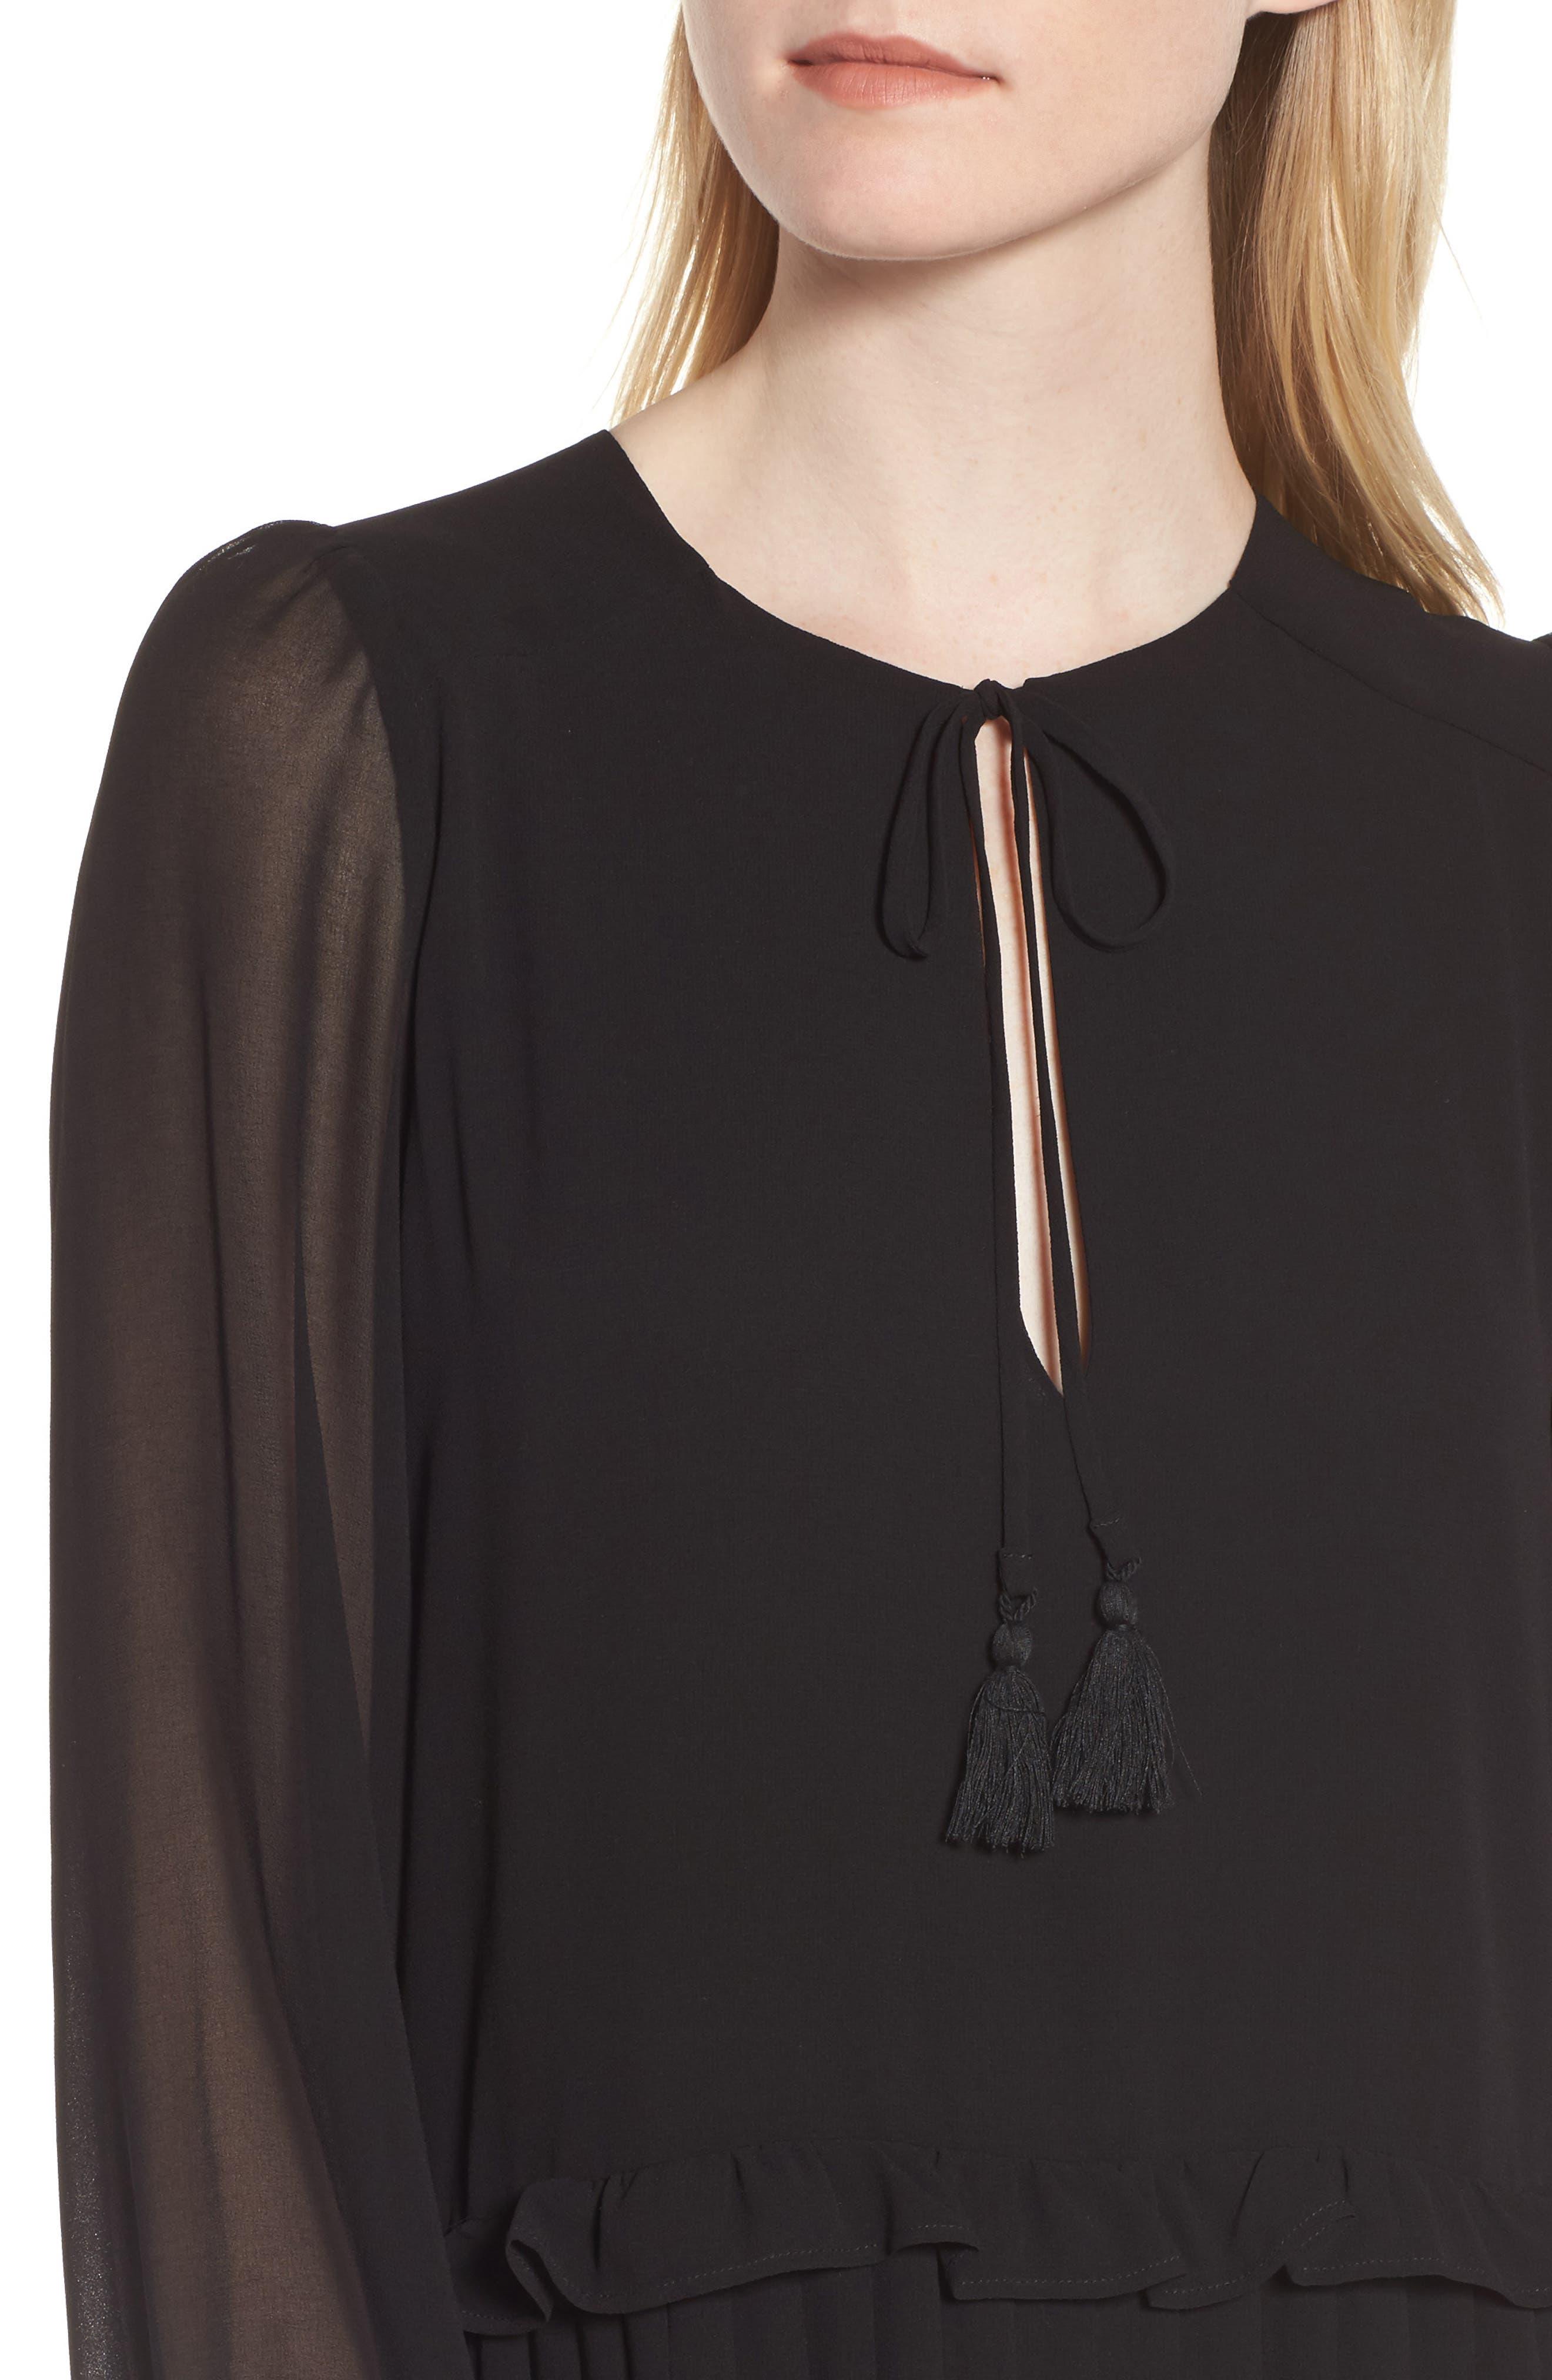 Morrison Shift Dress,                             Alternate thumbnail 4, color,                             Black